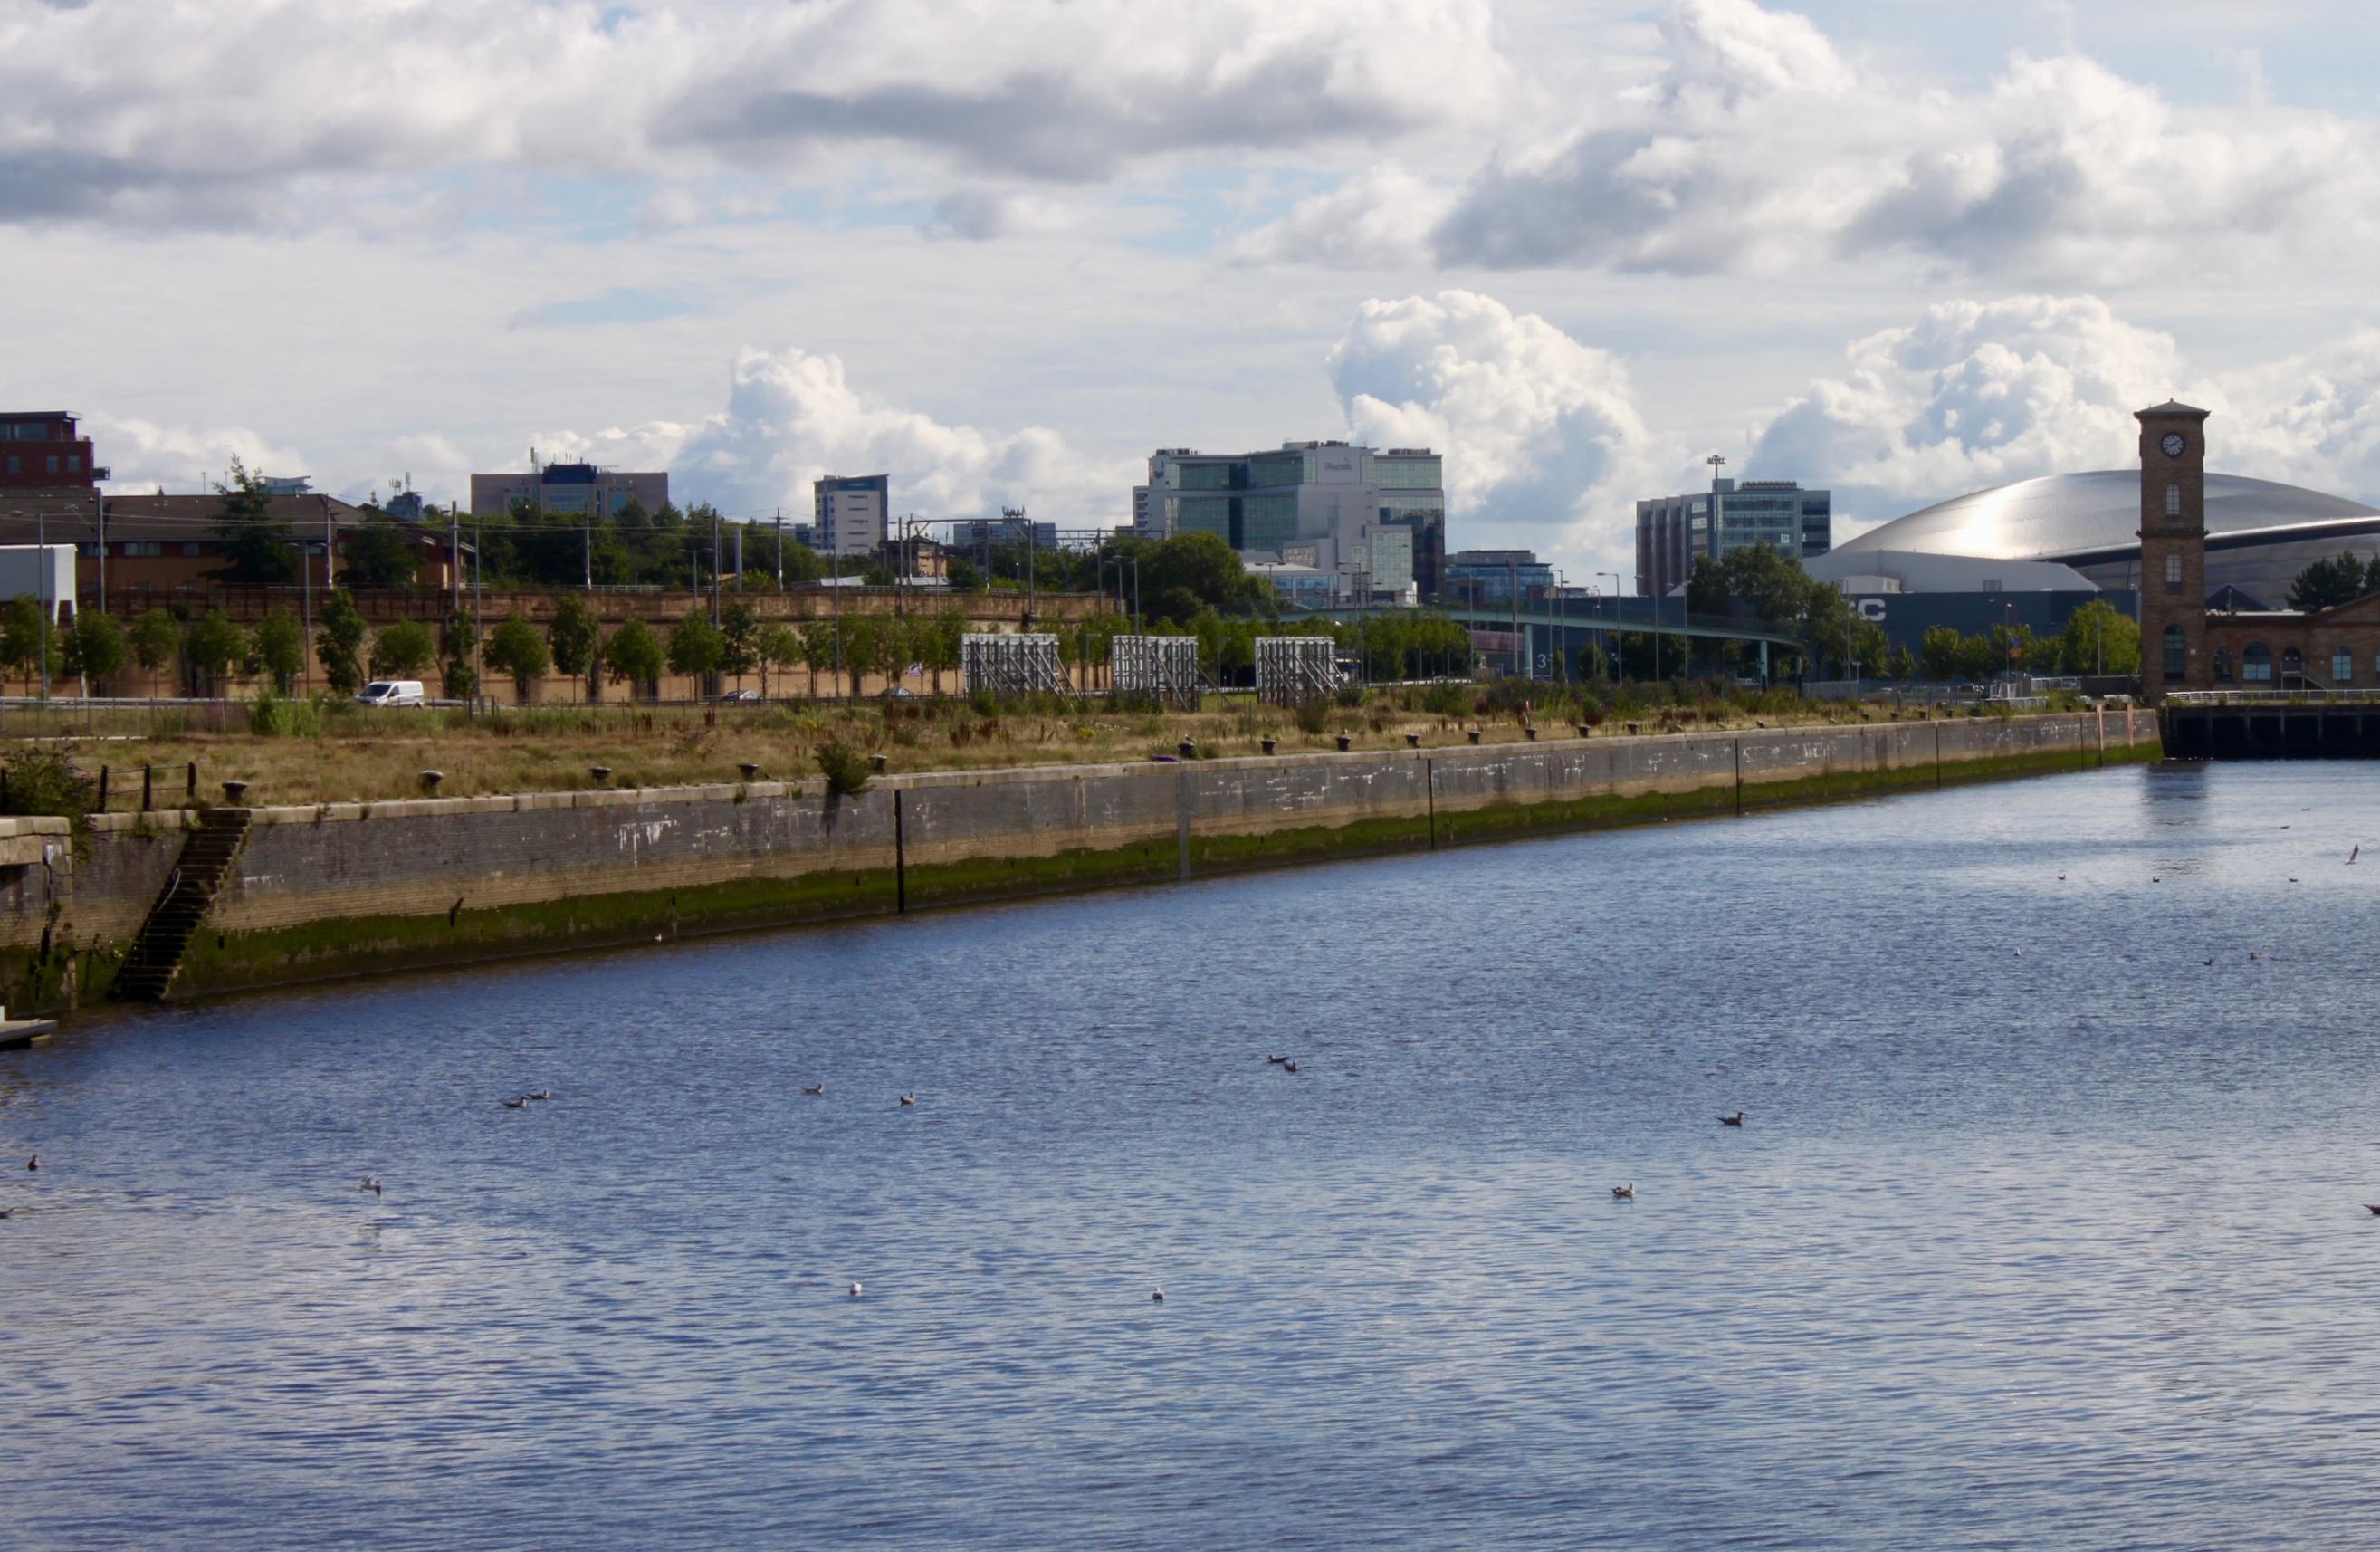 Quay on the river Clyde by Jez Braithwaite, Glasgow